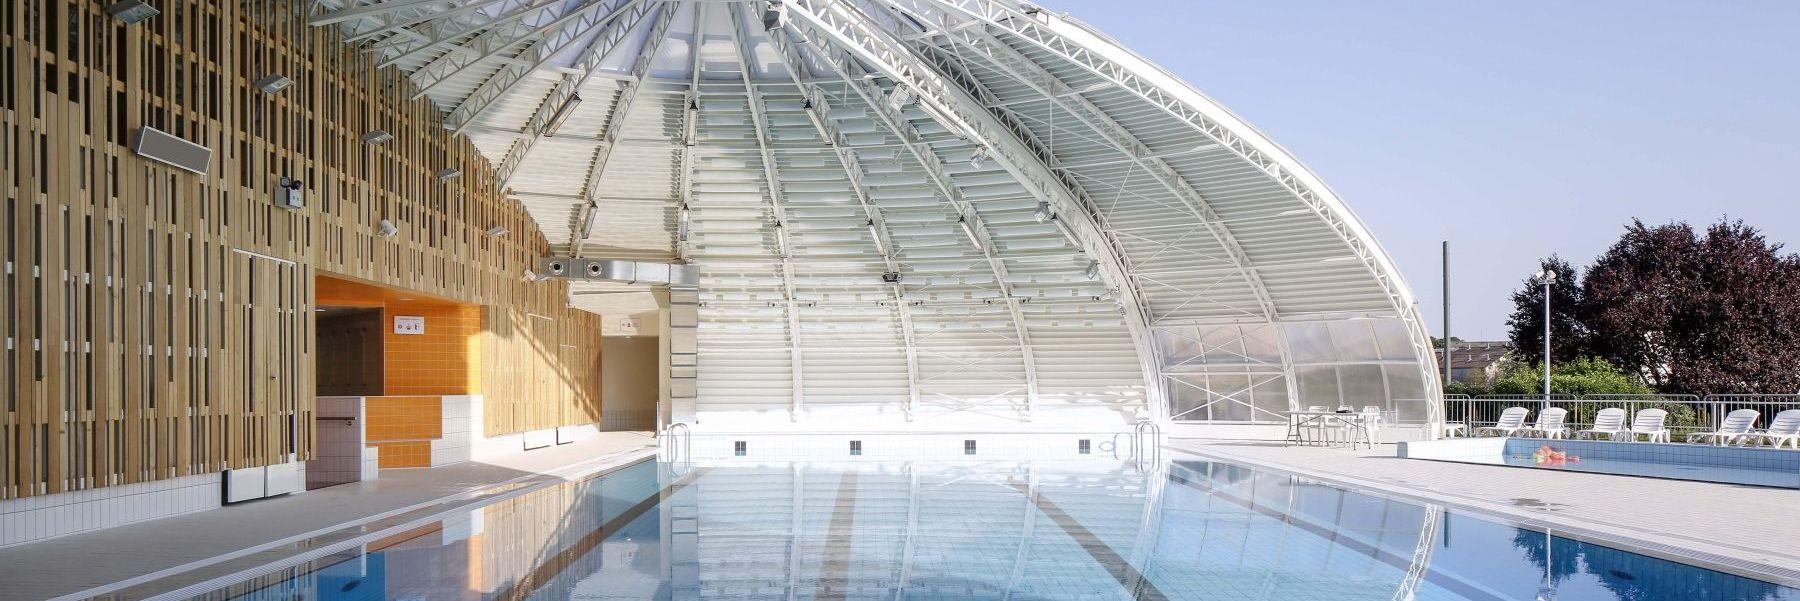 LEXAN THERMOCLEAR multiwall sheet poolcovers rooflights skylights verandas greenhouses interiors